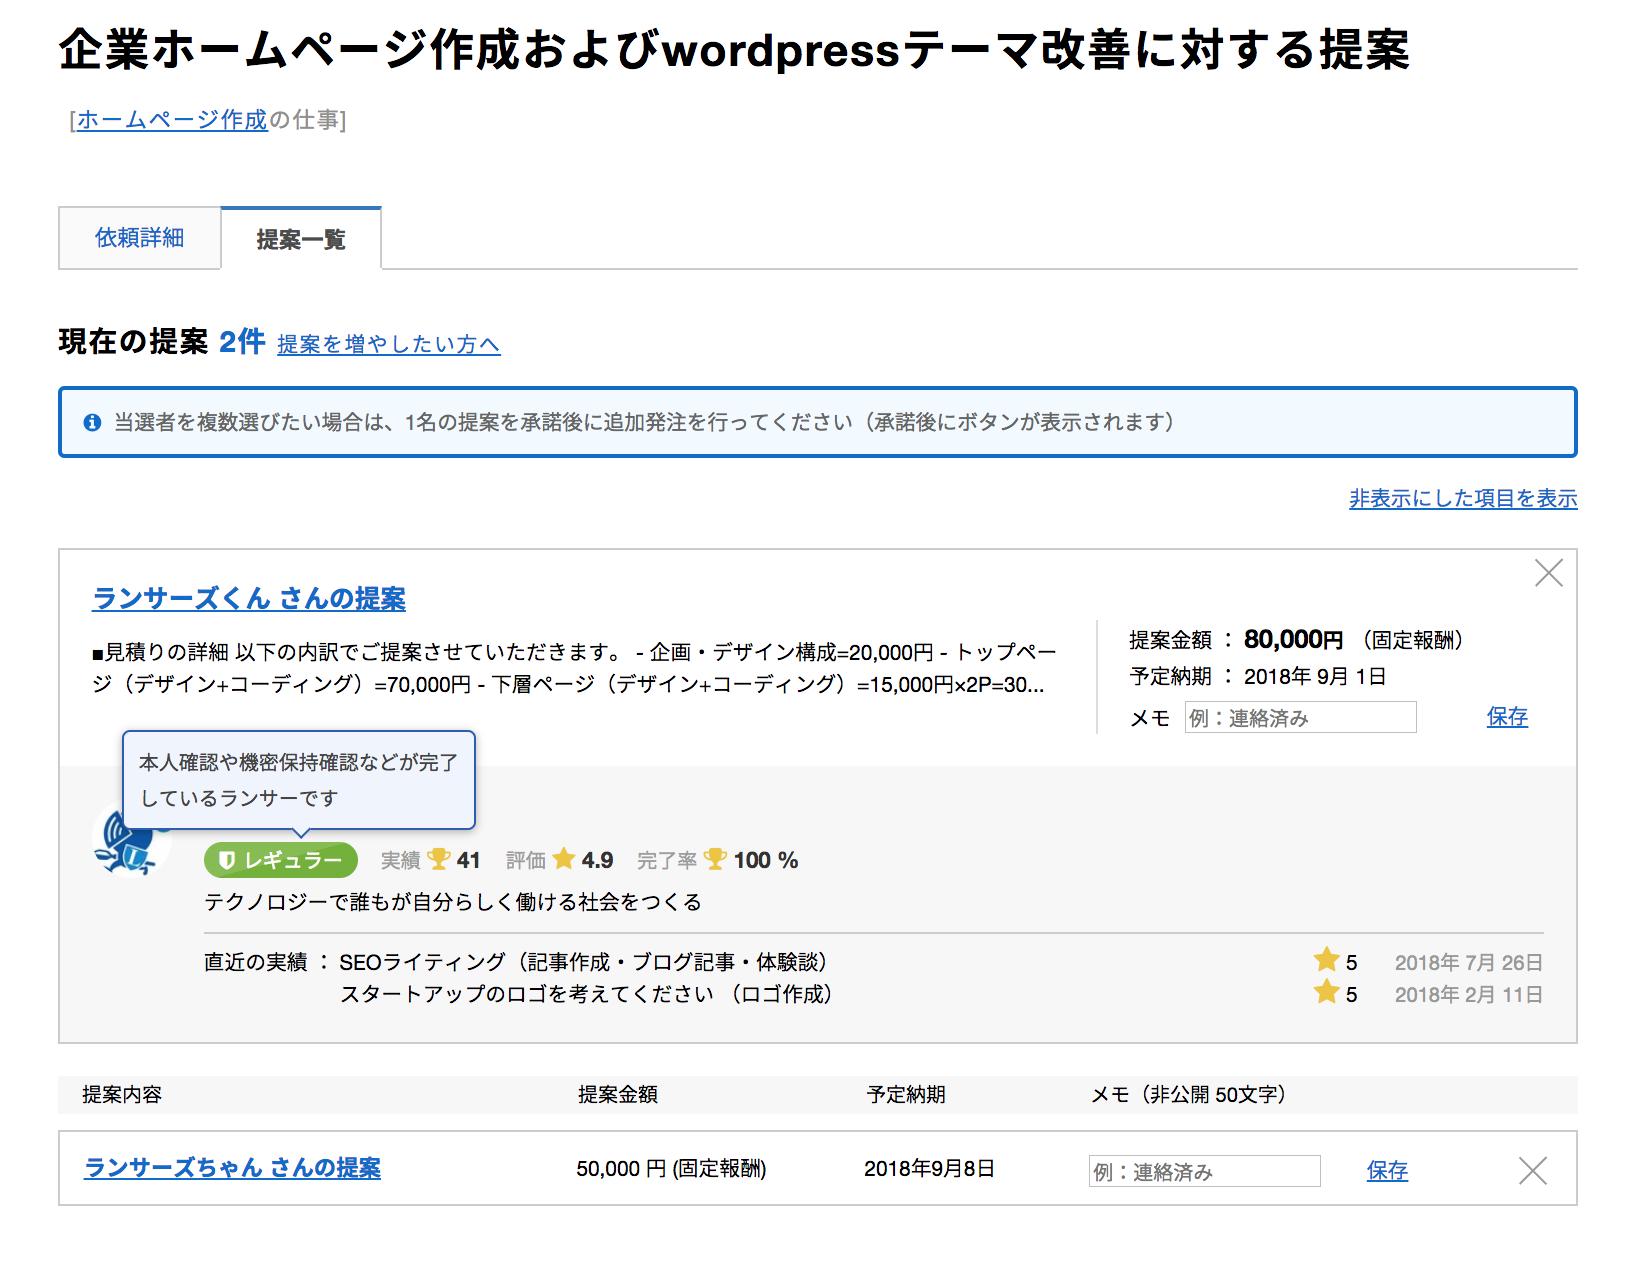 project_proposals